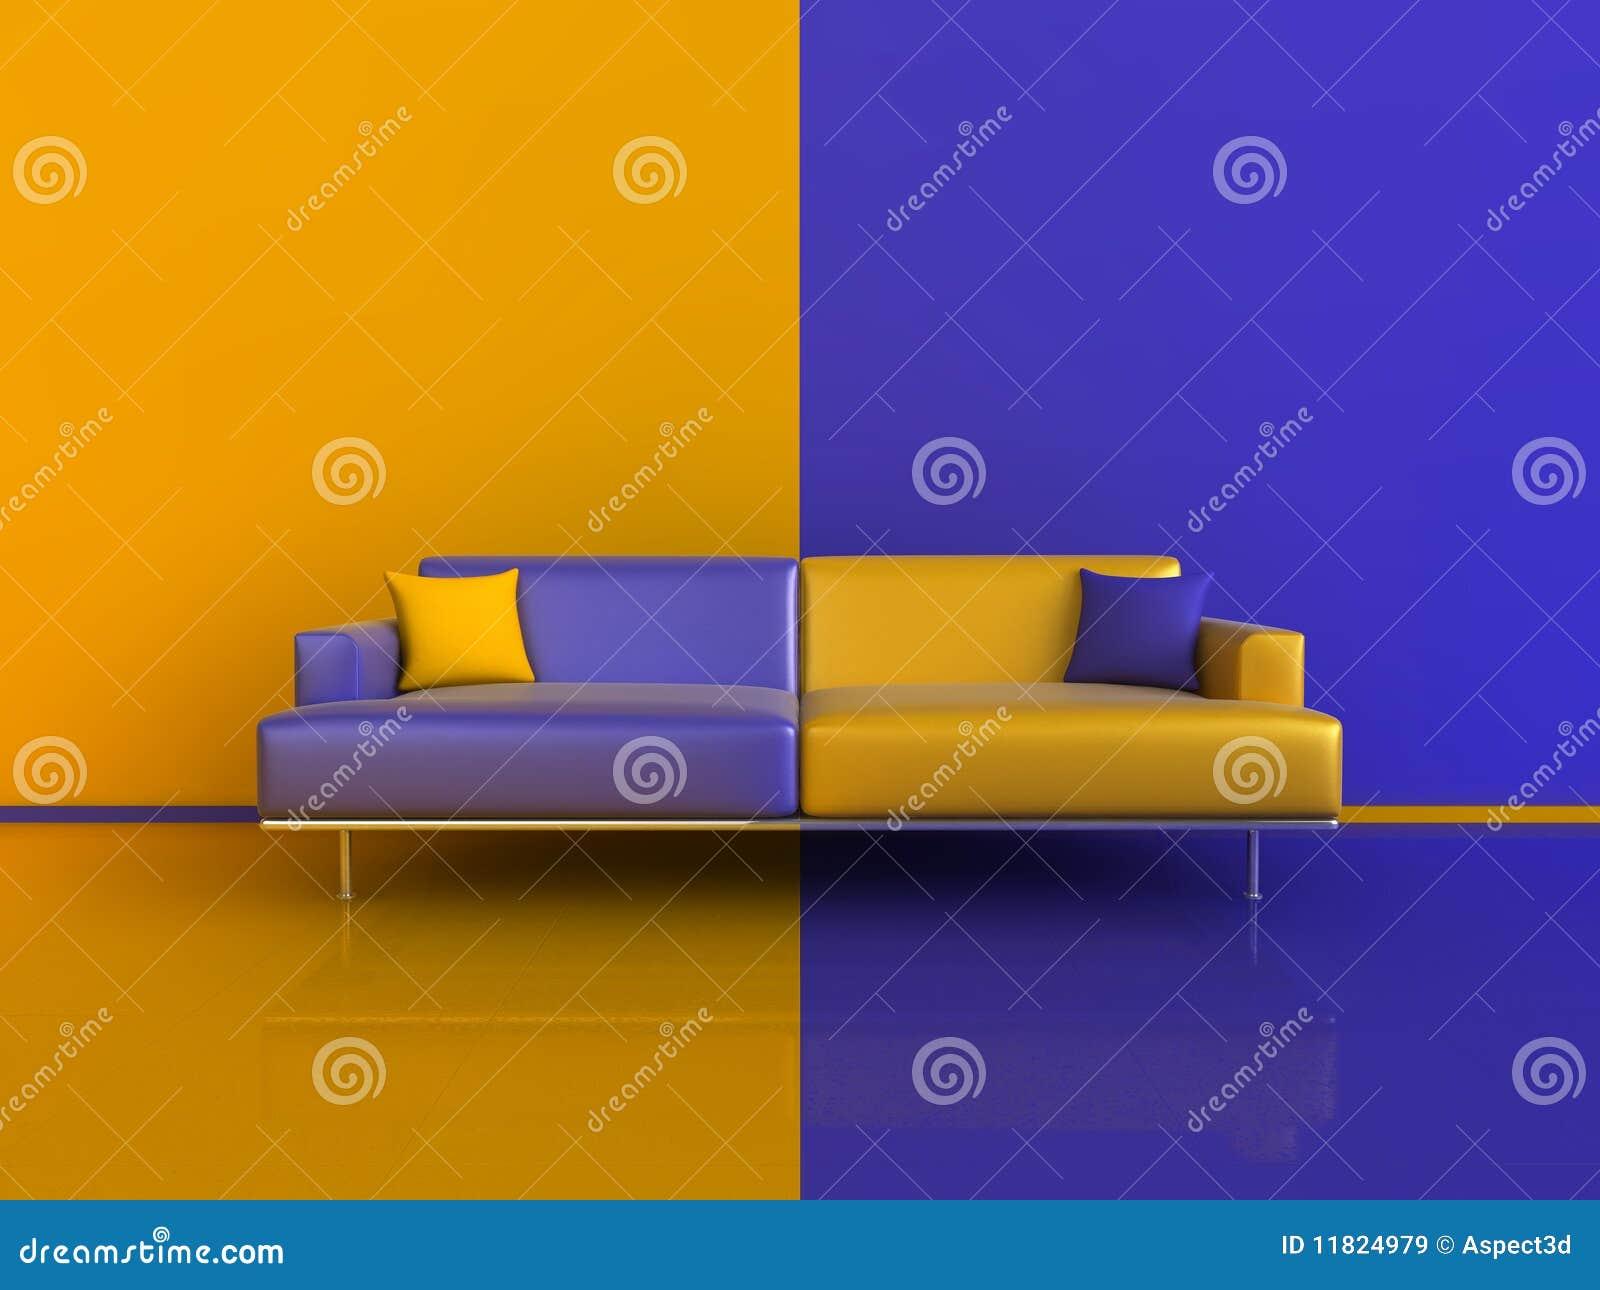 Orange/Blue Contrast Interior Stock Illustration - Illustration of ...